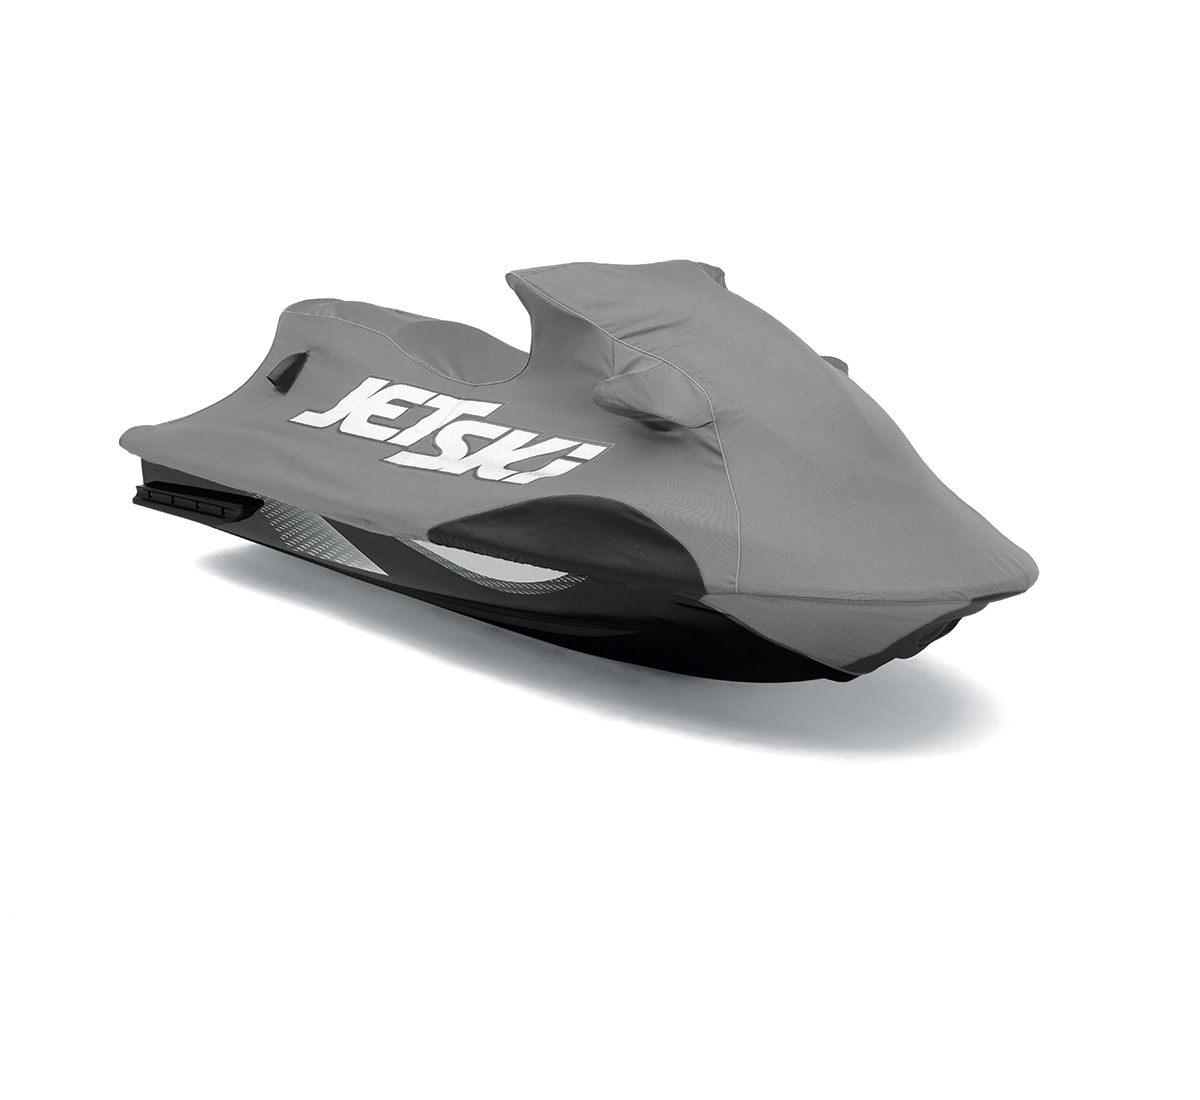 Vacu-Hold Jet Ski® STX®/STX®-15F Cover, Silver